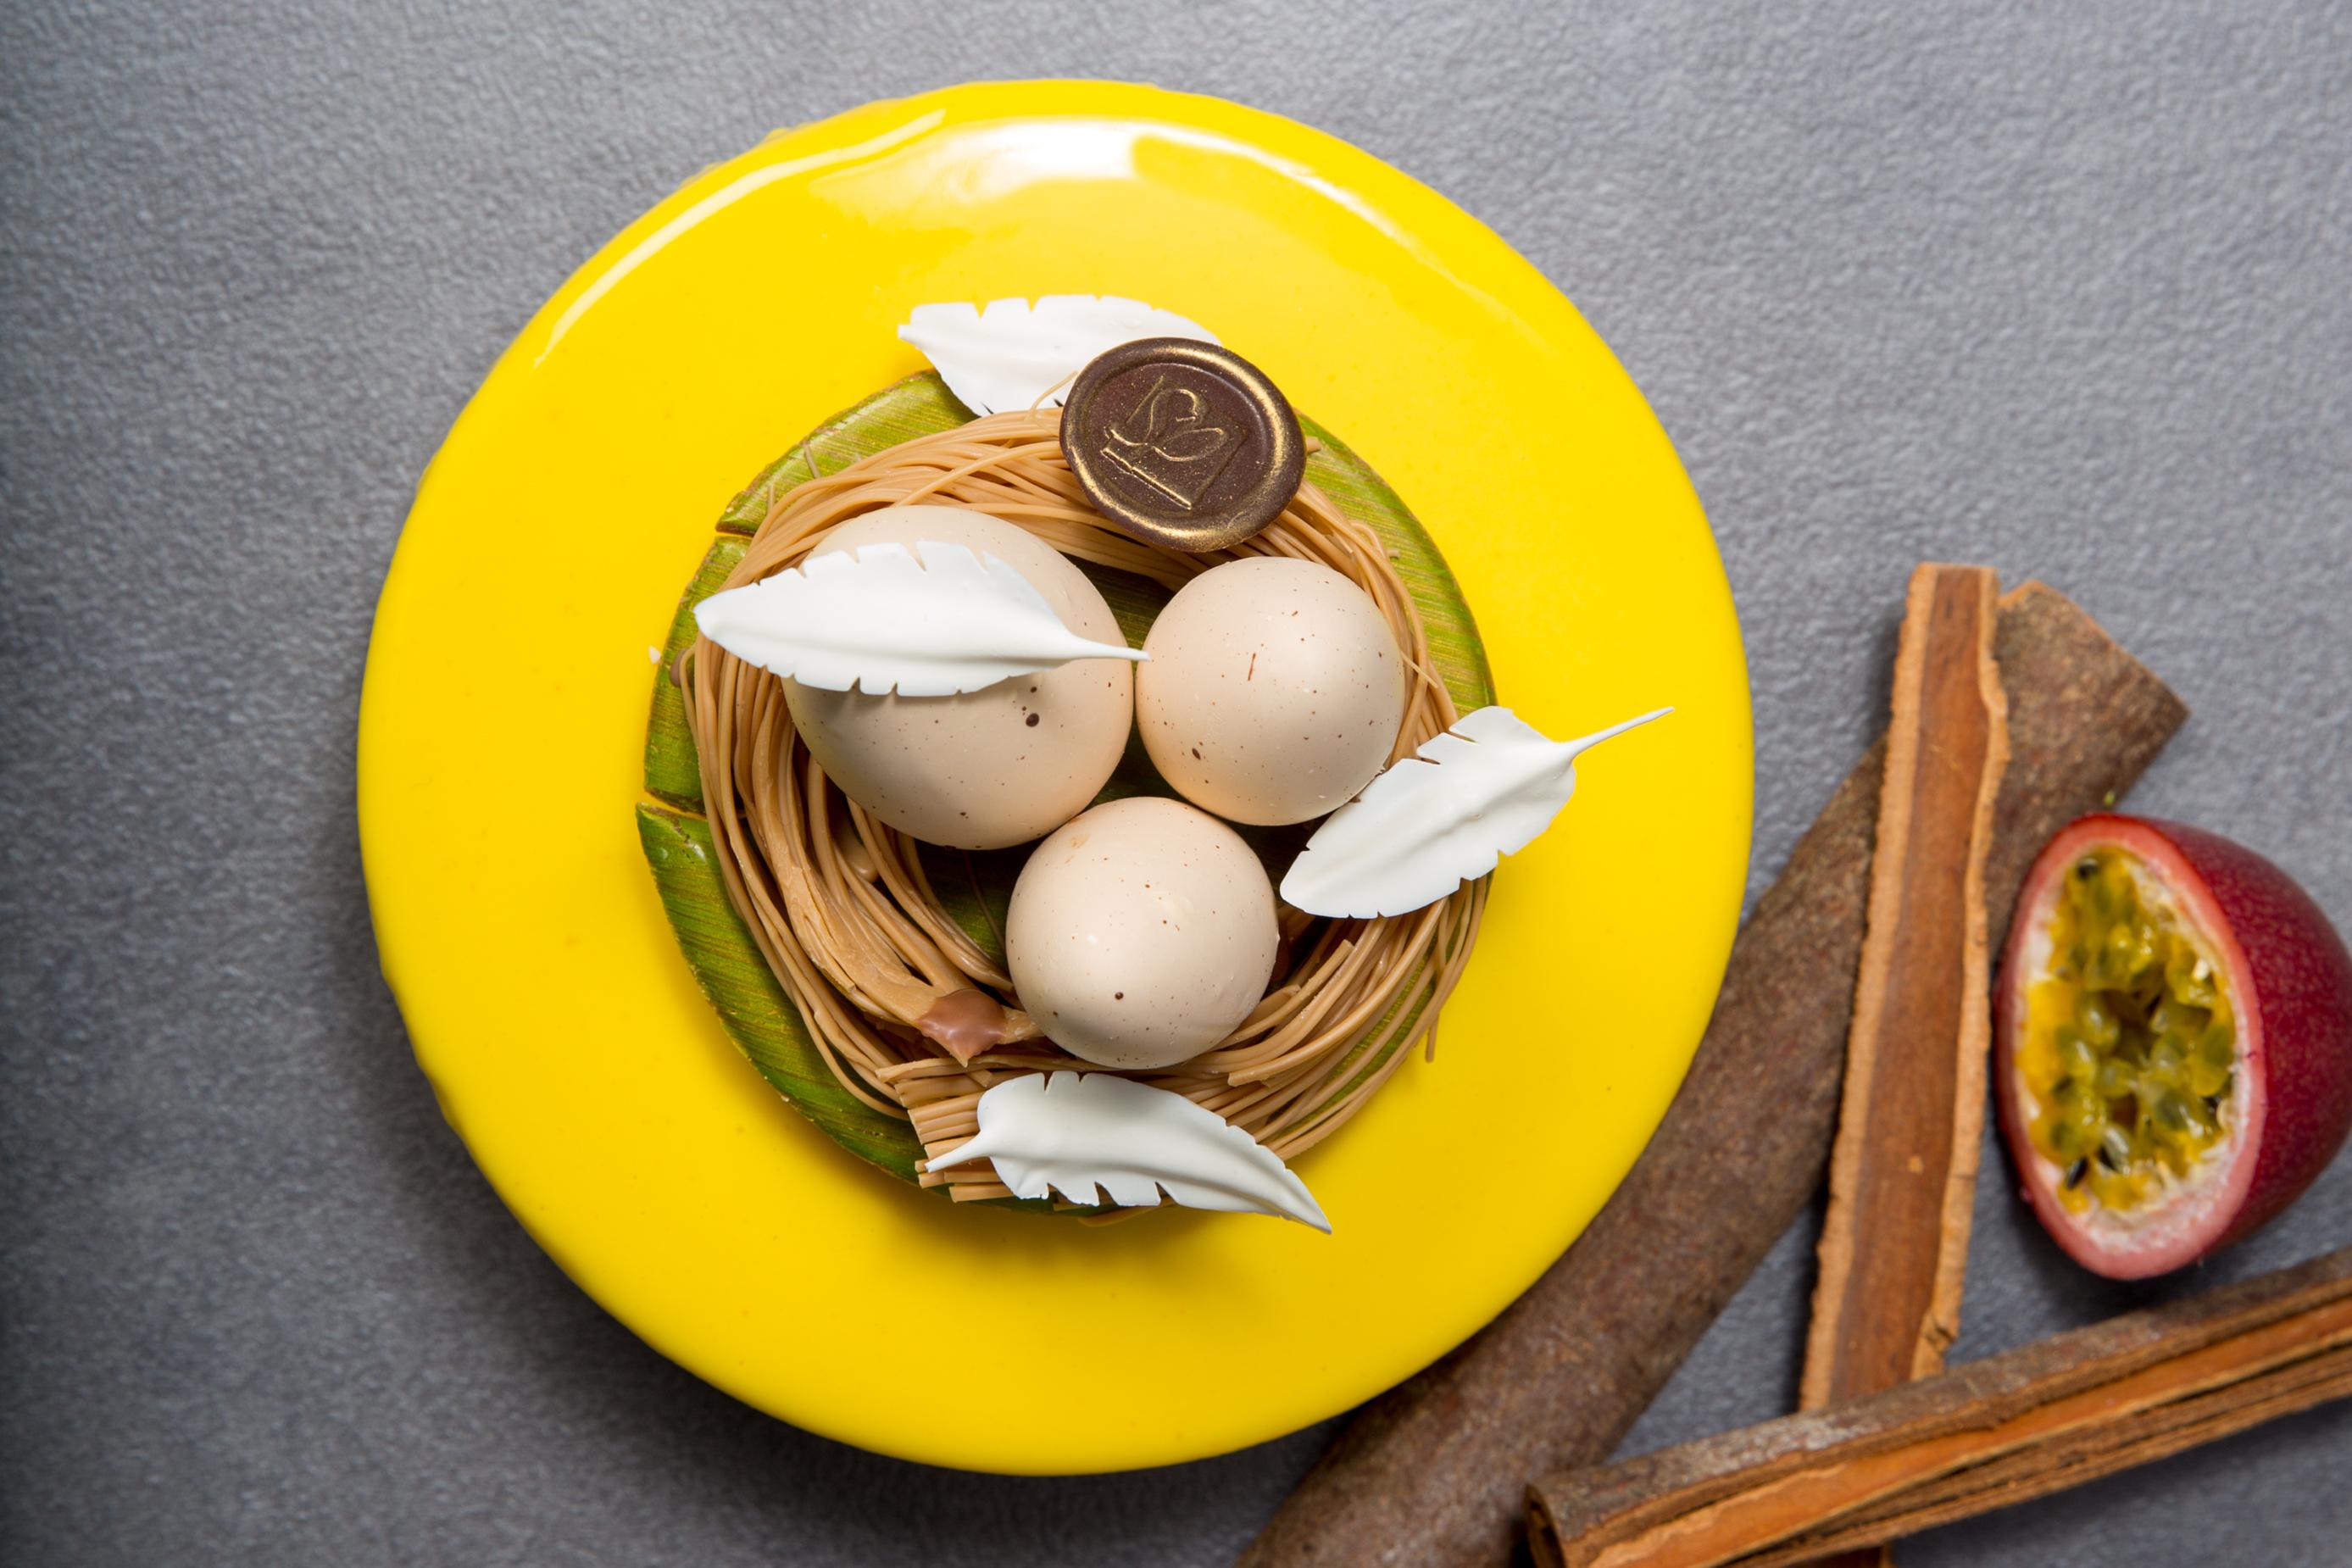 reportage-culinaire-©gaellebc-JPGhd-053